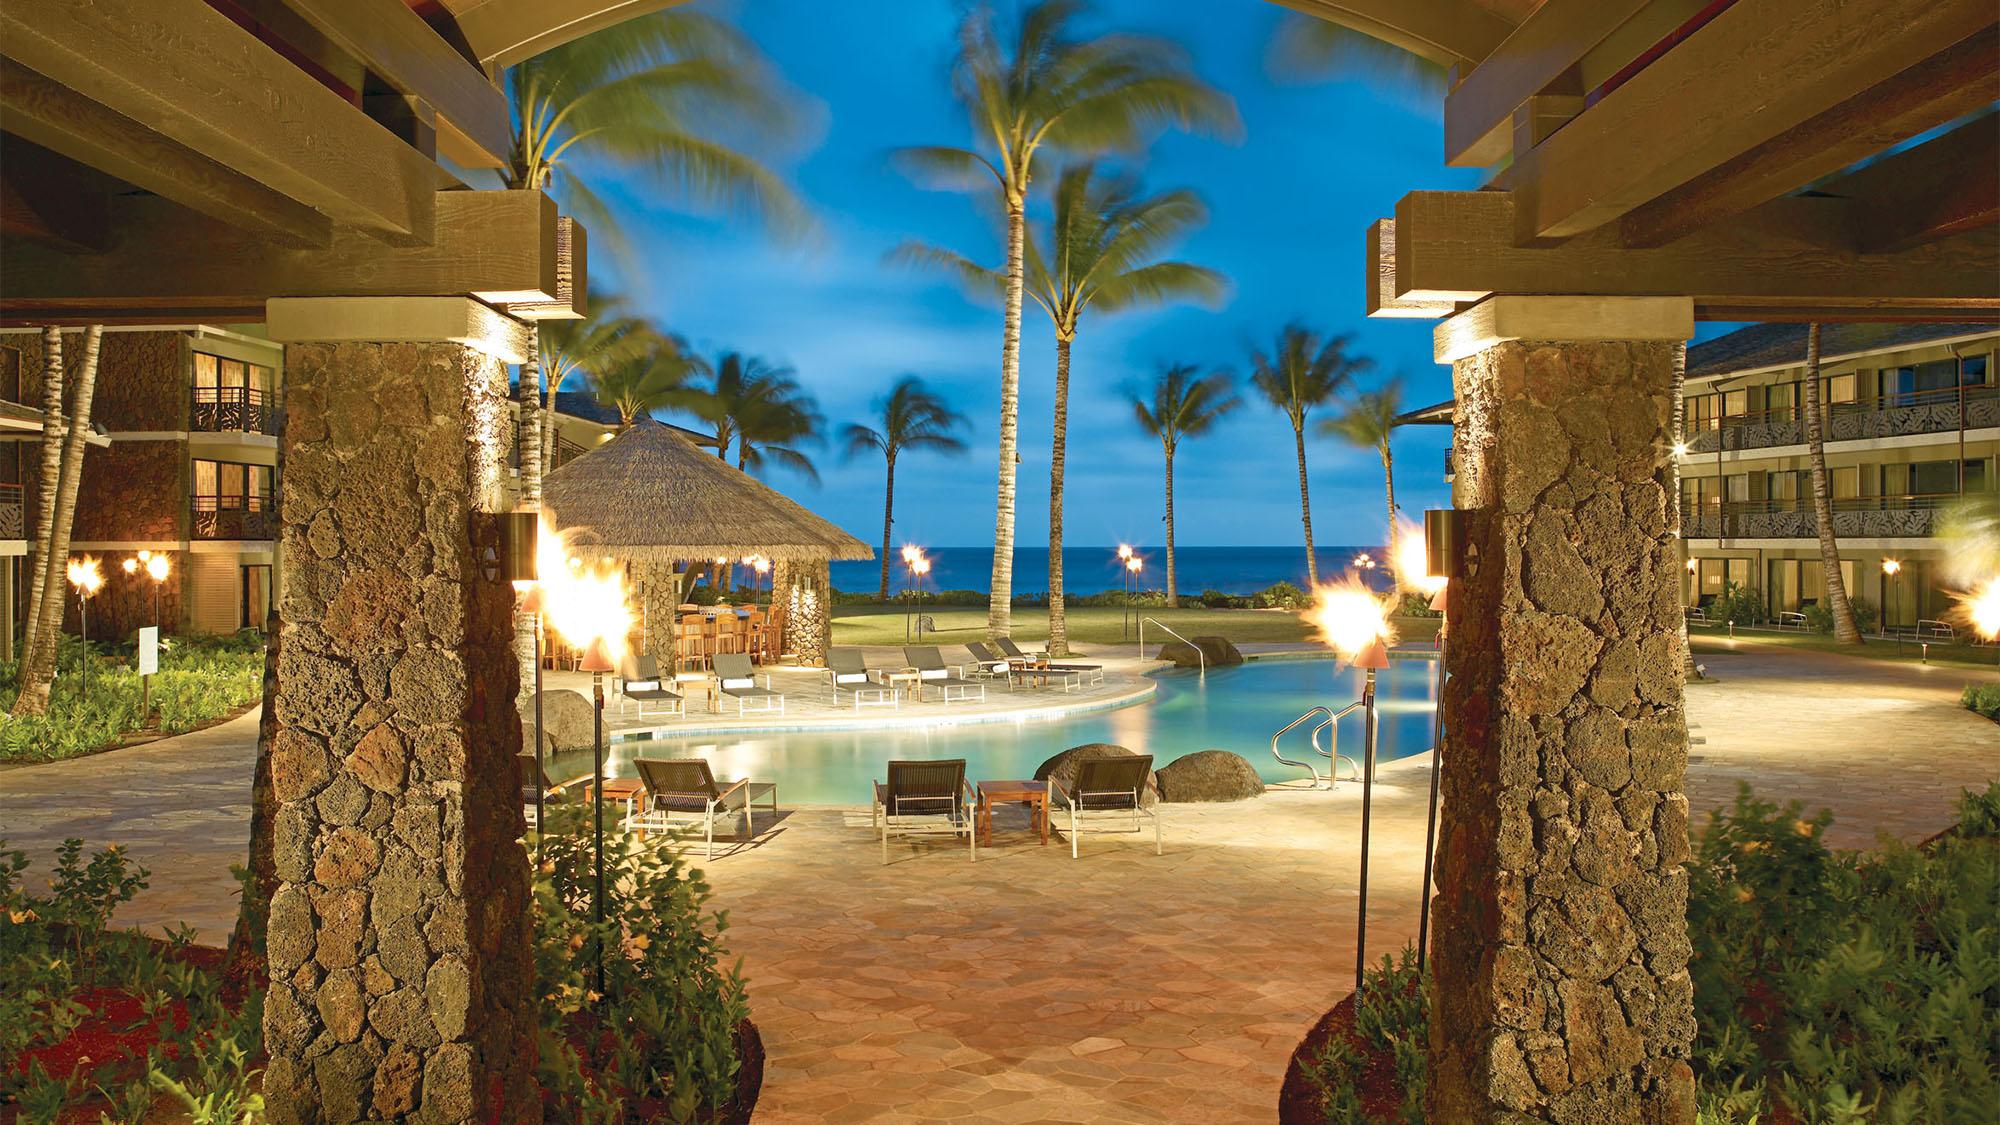 best kitchen gallery conde nast traveler honors kauais koa kea hotel travel weekly of kauai